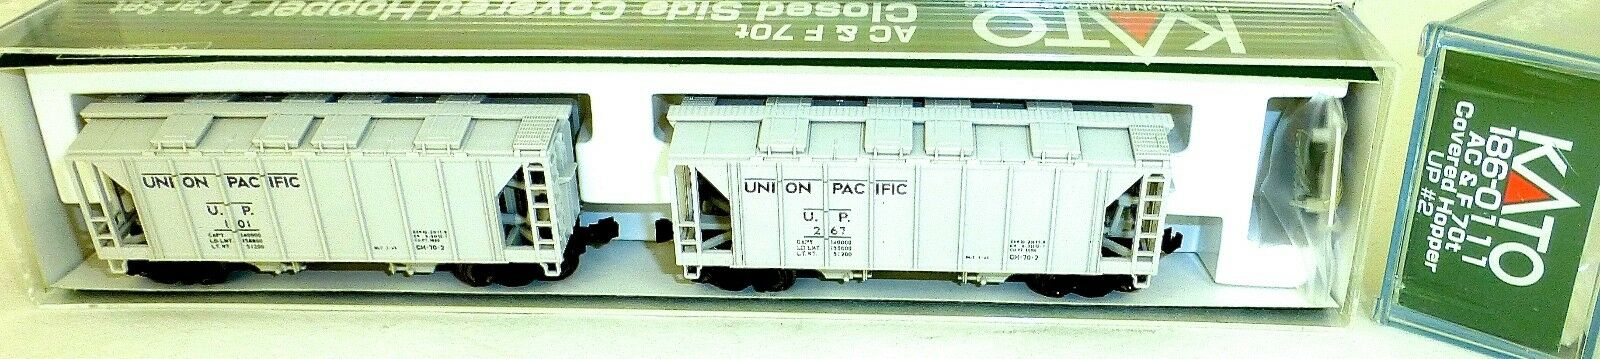 Kato 186-0111 Ac&f 70t 2 Coche Up Closed Side Cubiertos Tolva Emb.orig N 1 160 HS5